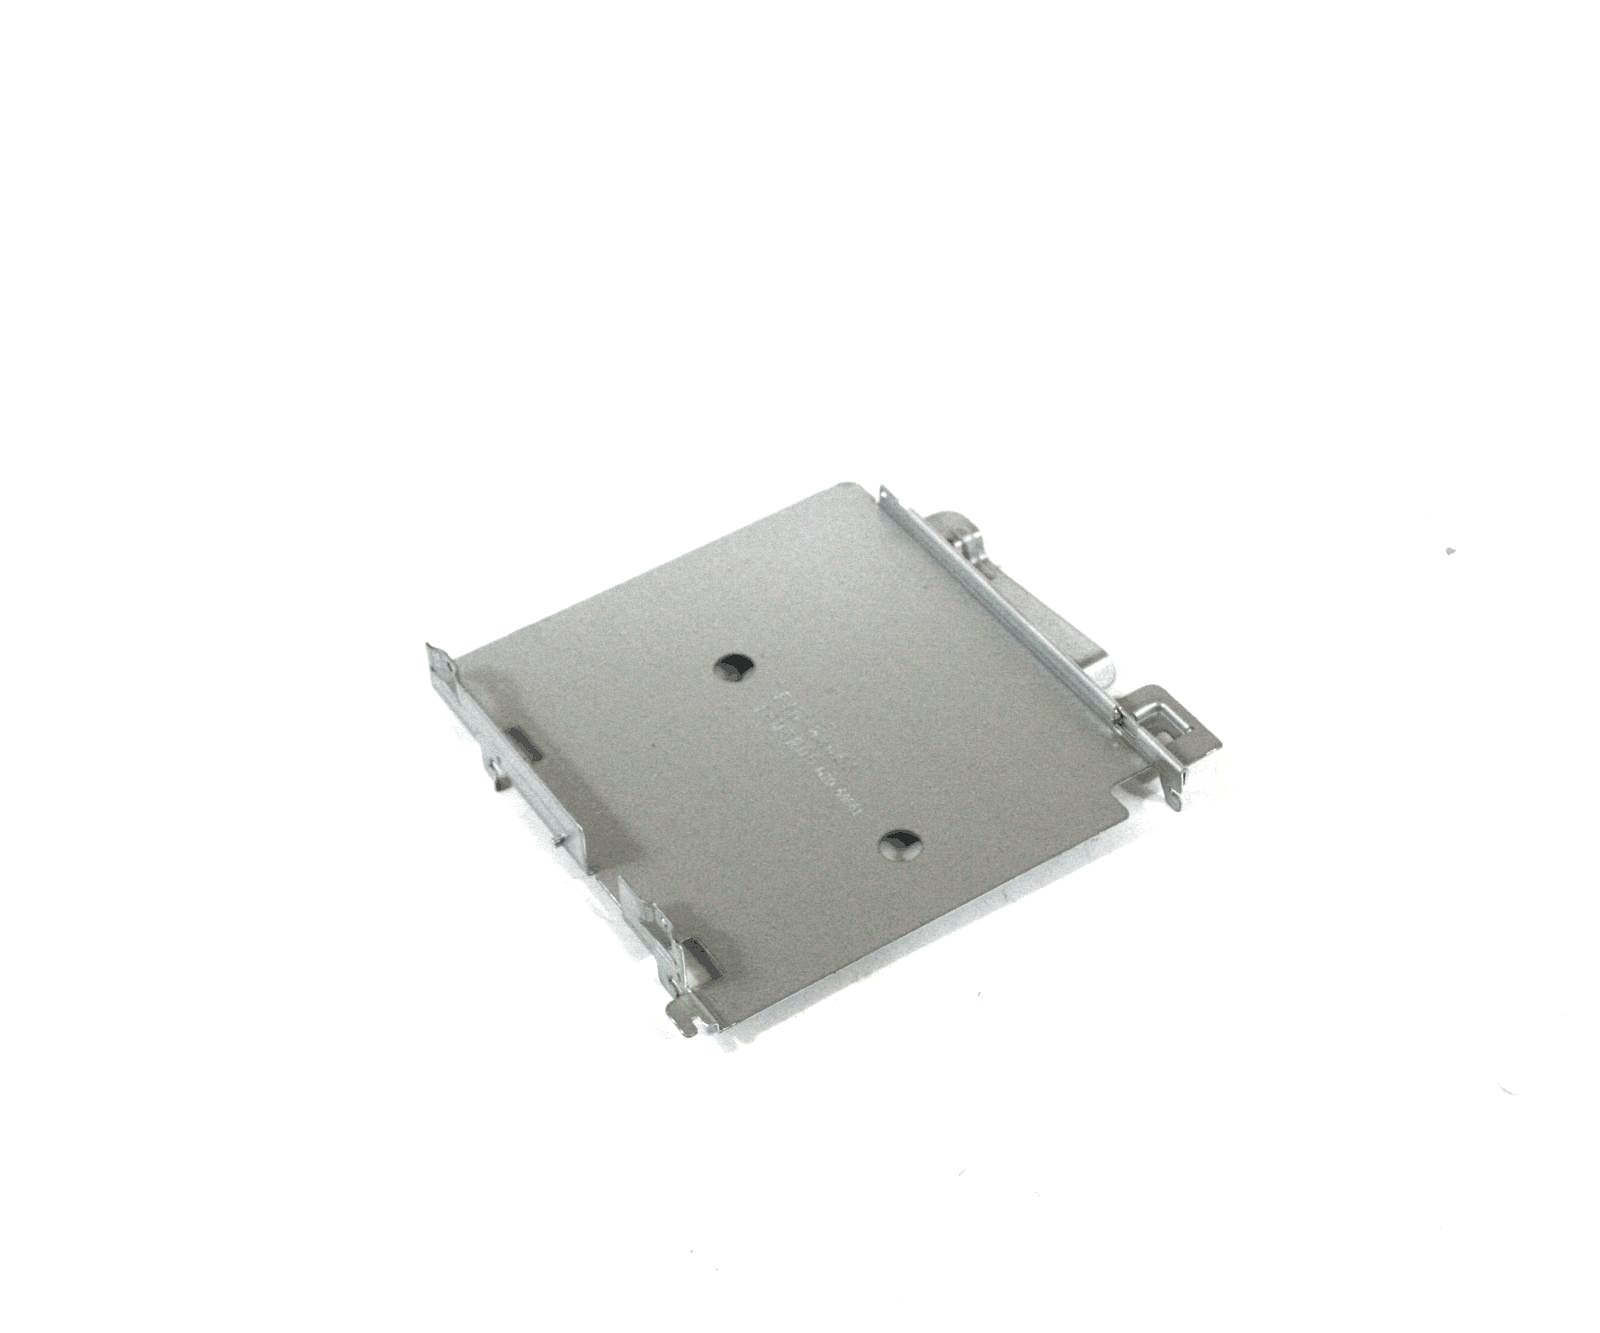 Genuine Dell Optiplex 960 755 760 780 SFF Computer Optical Drive Caddy 0WX053, WX053